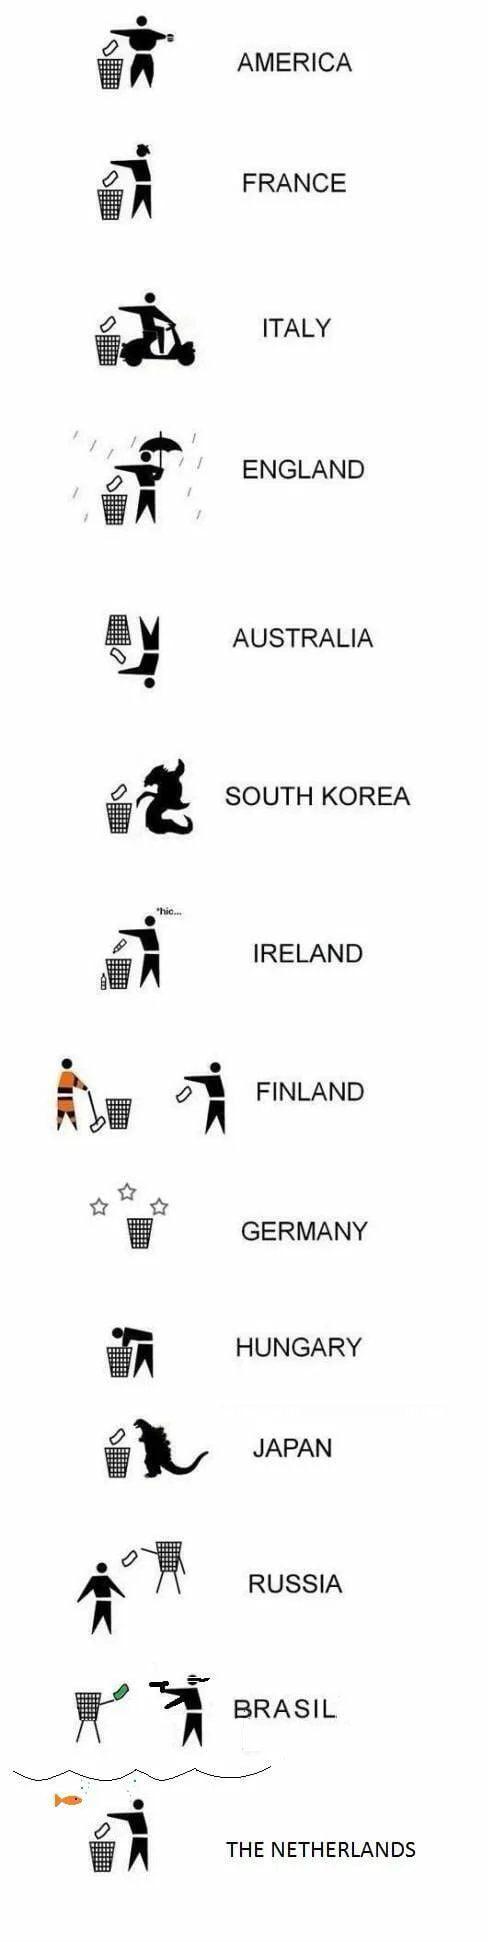 Trash can use worldwide